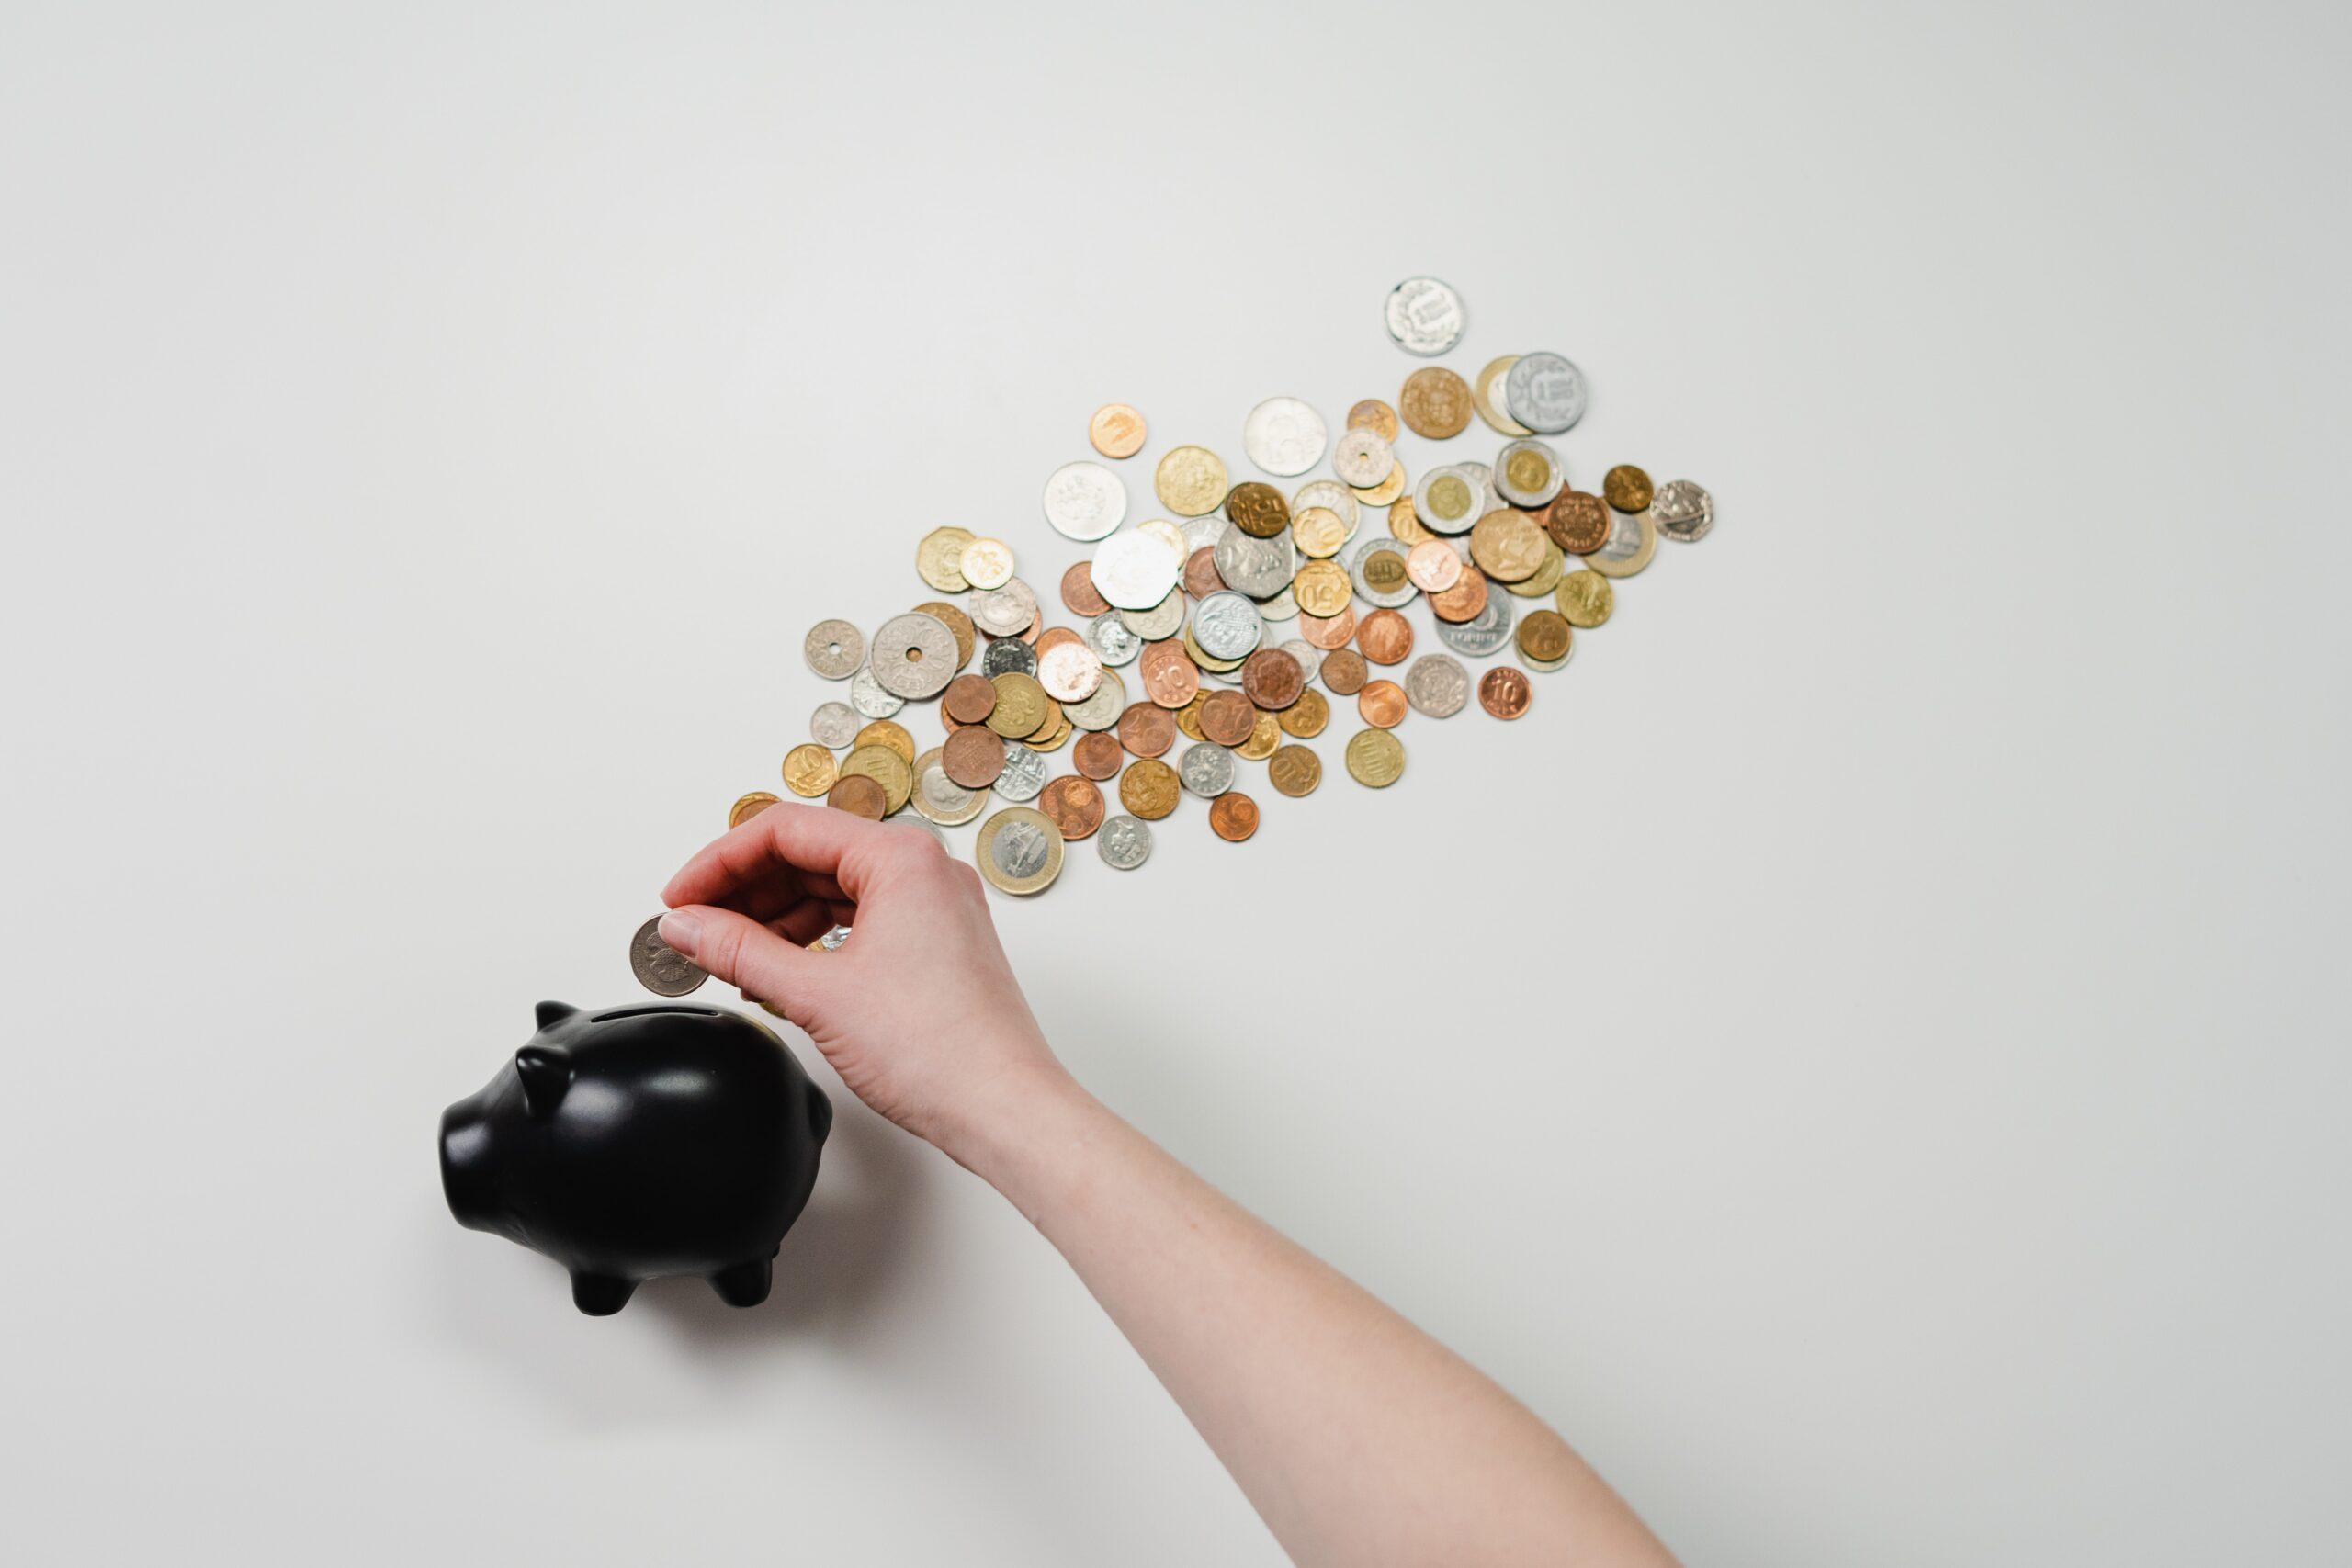 besparen hypotheeklasten